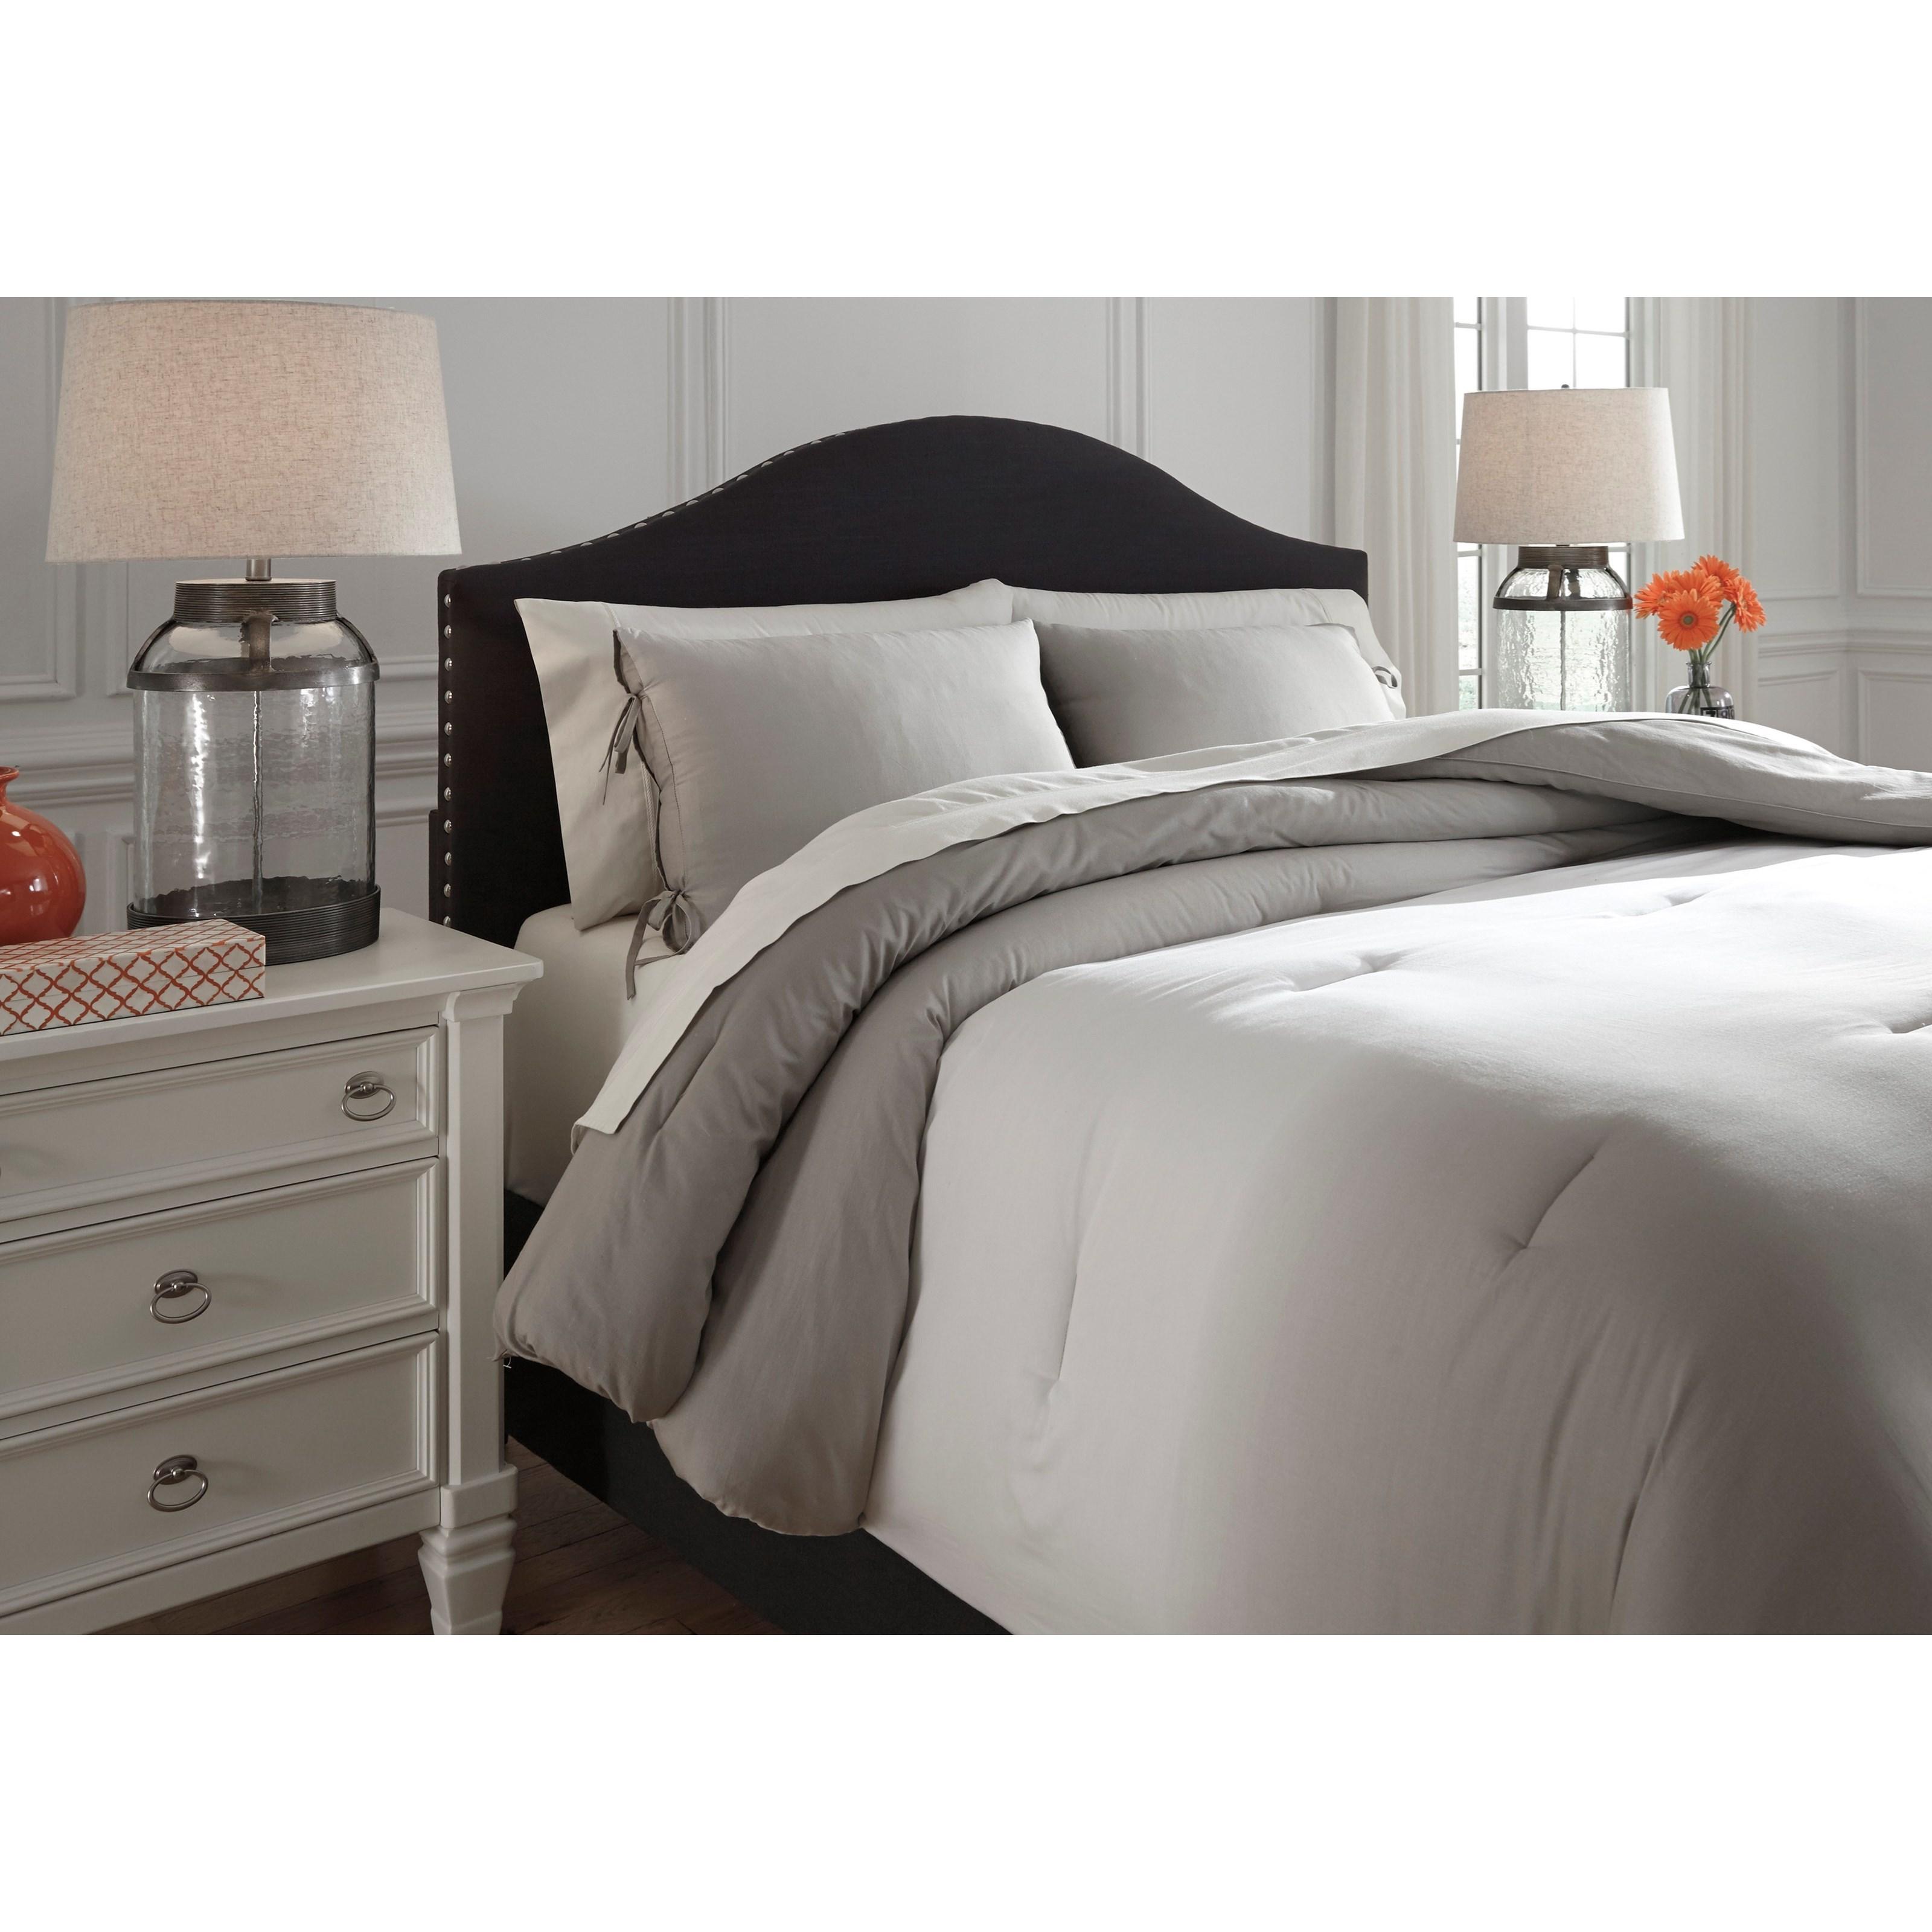 Ashley Signature Design Bedding Sets Q243023k King Aracely Taupe Comforter Set Dunk Bright